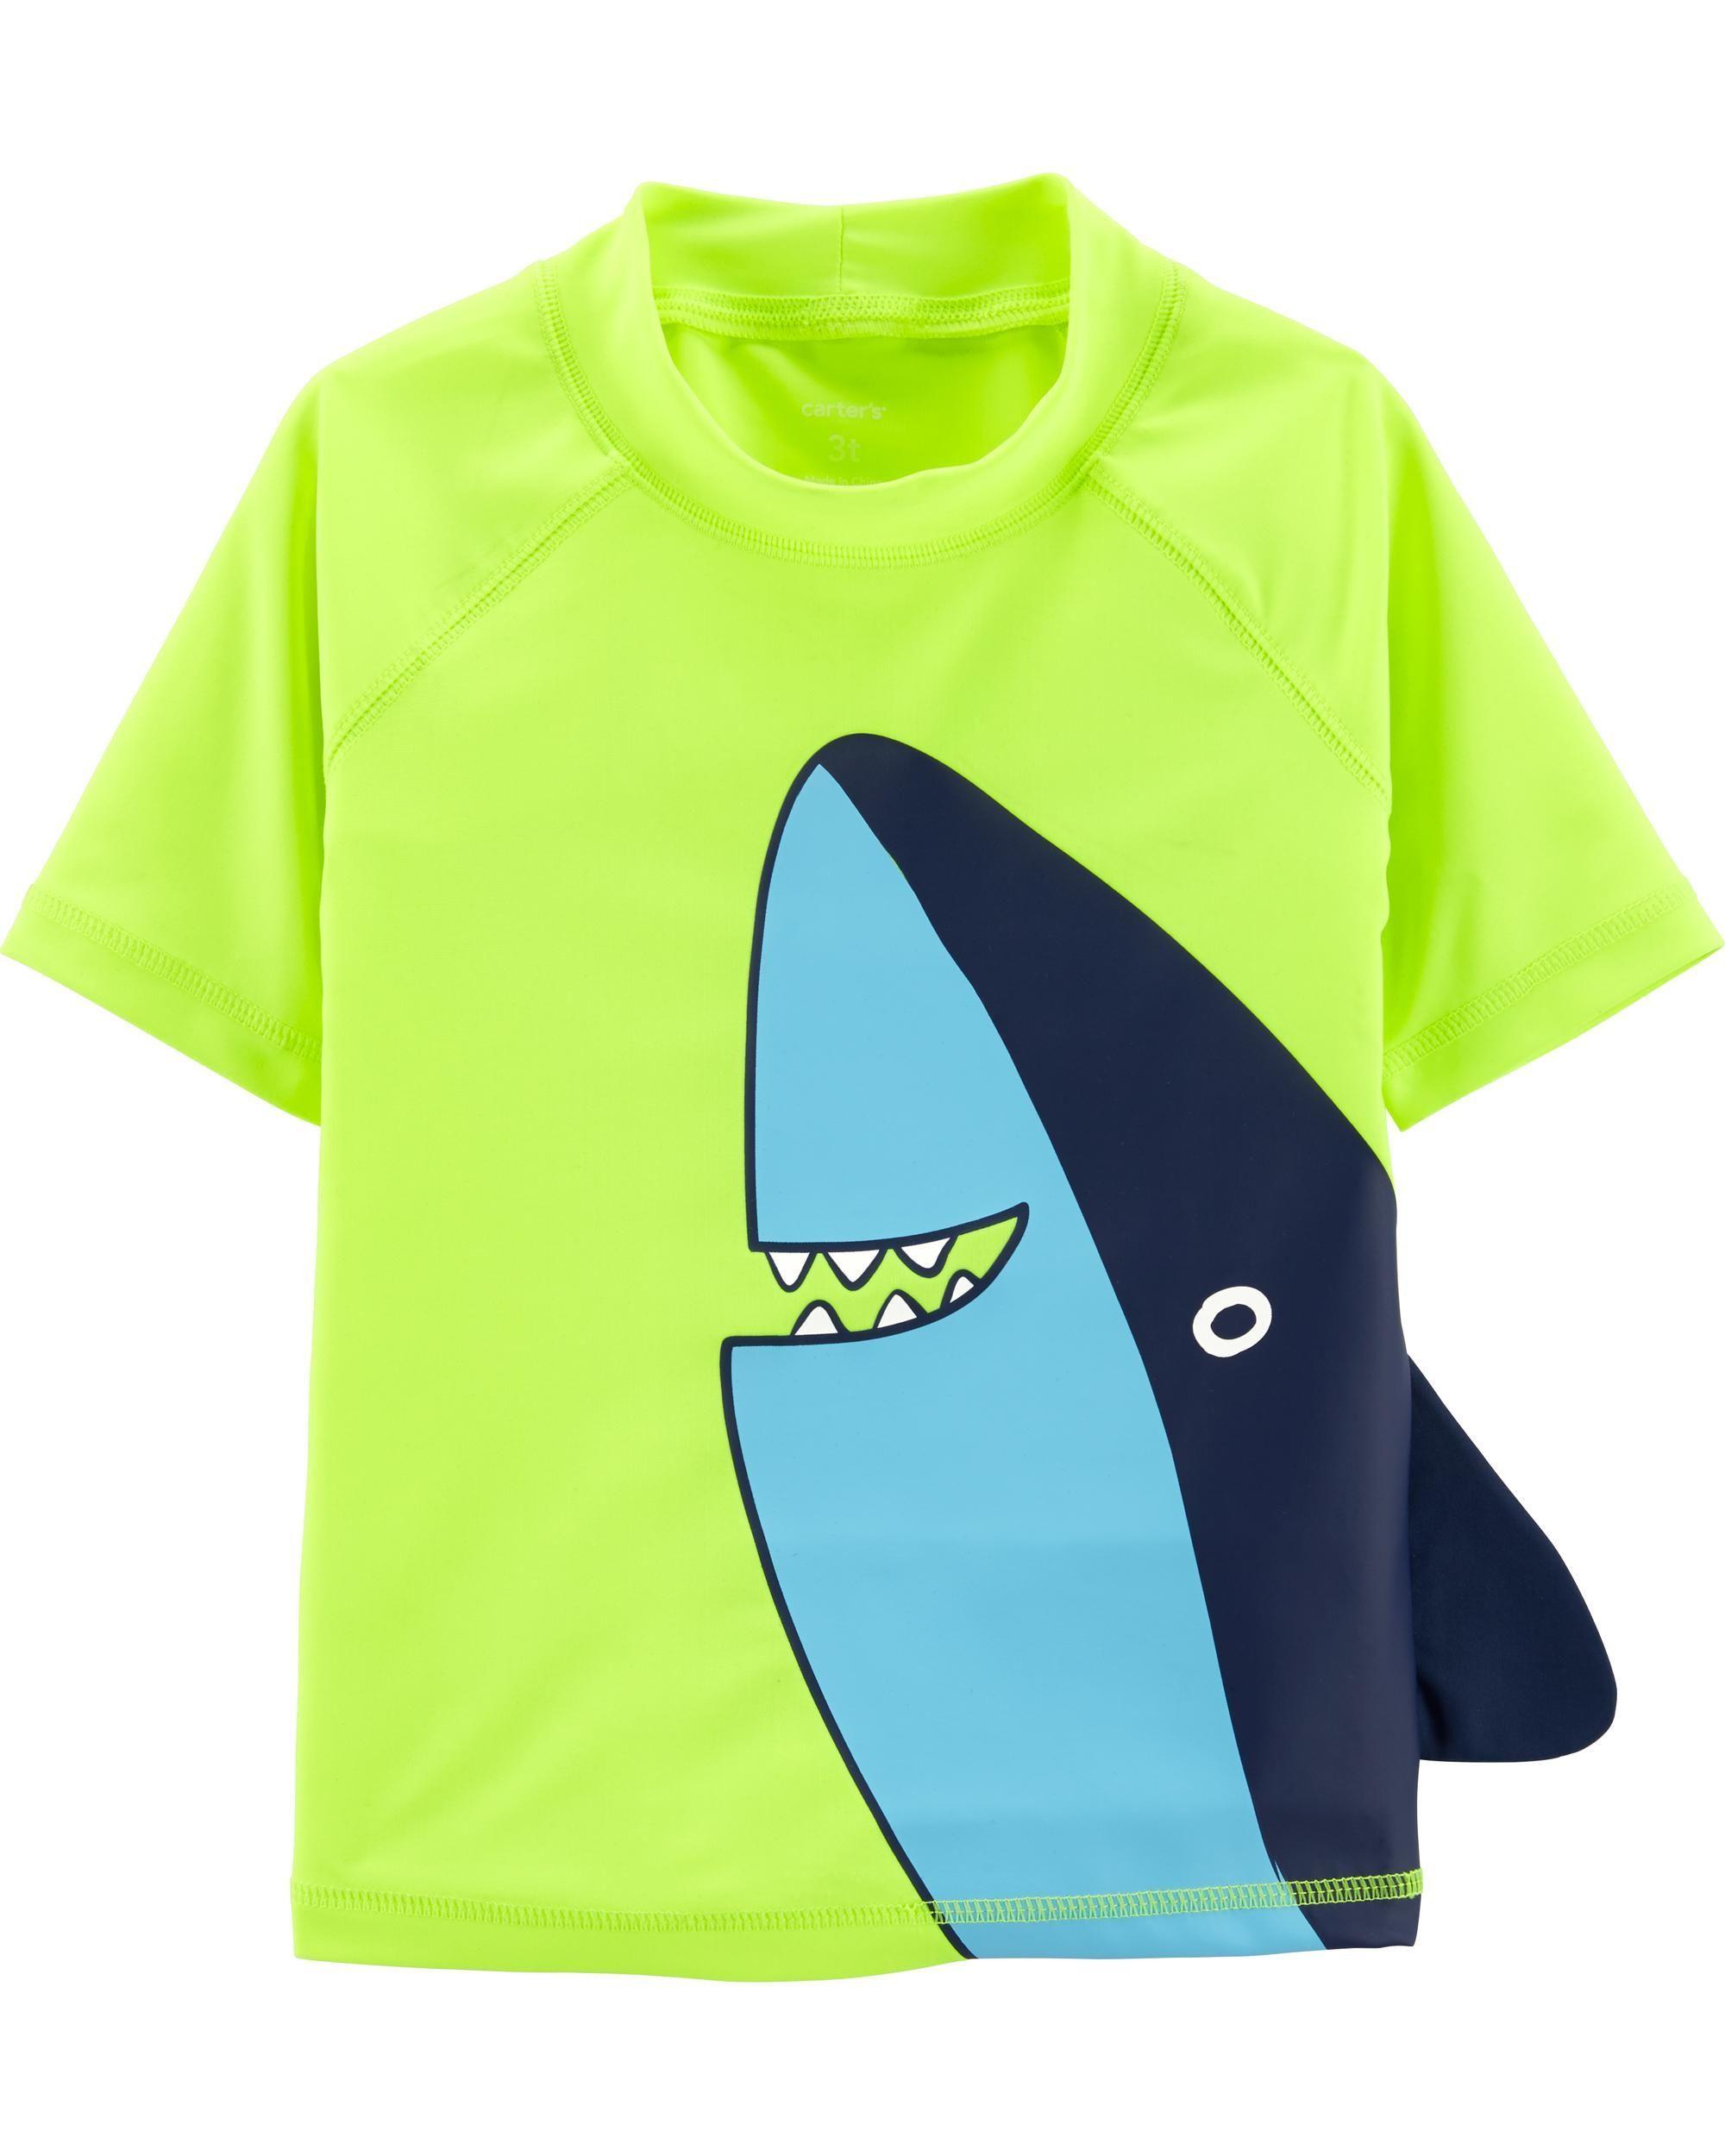 84c9caccb8 Shark Rashguard | SWIM | Baby boy swimwear, Boys swimwear, Carters ...